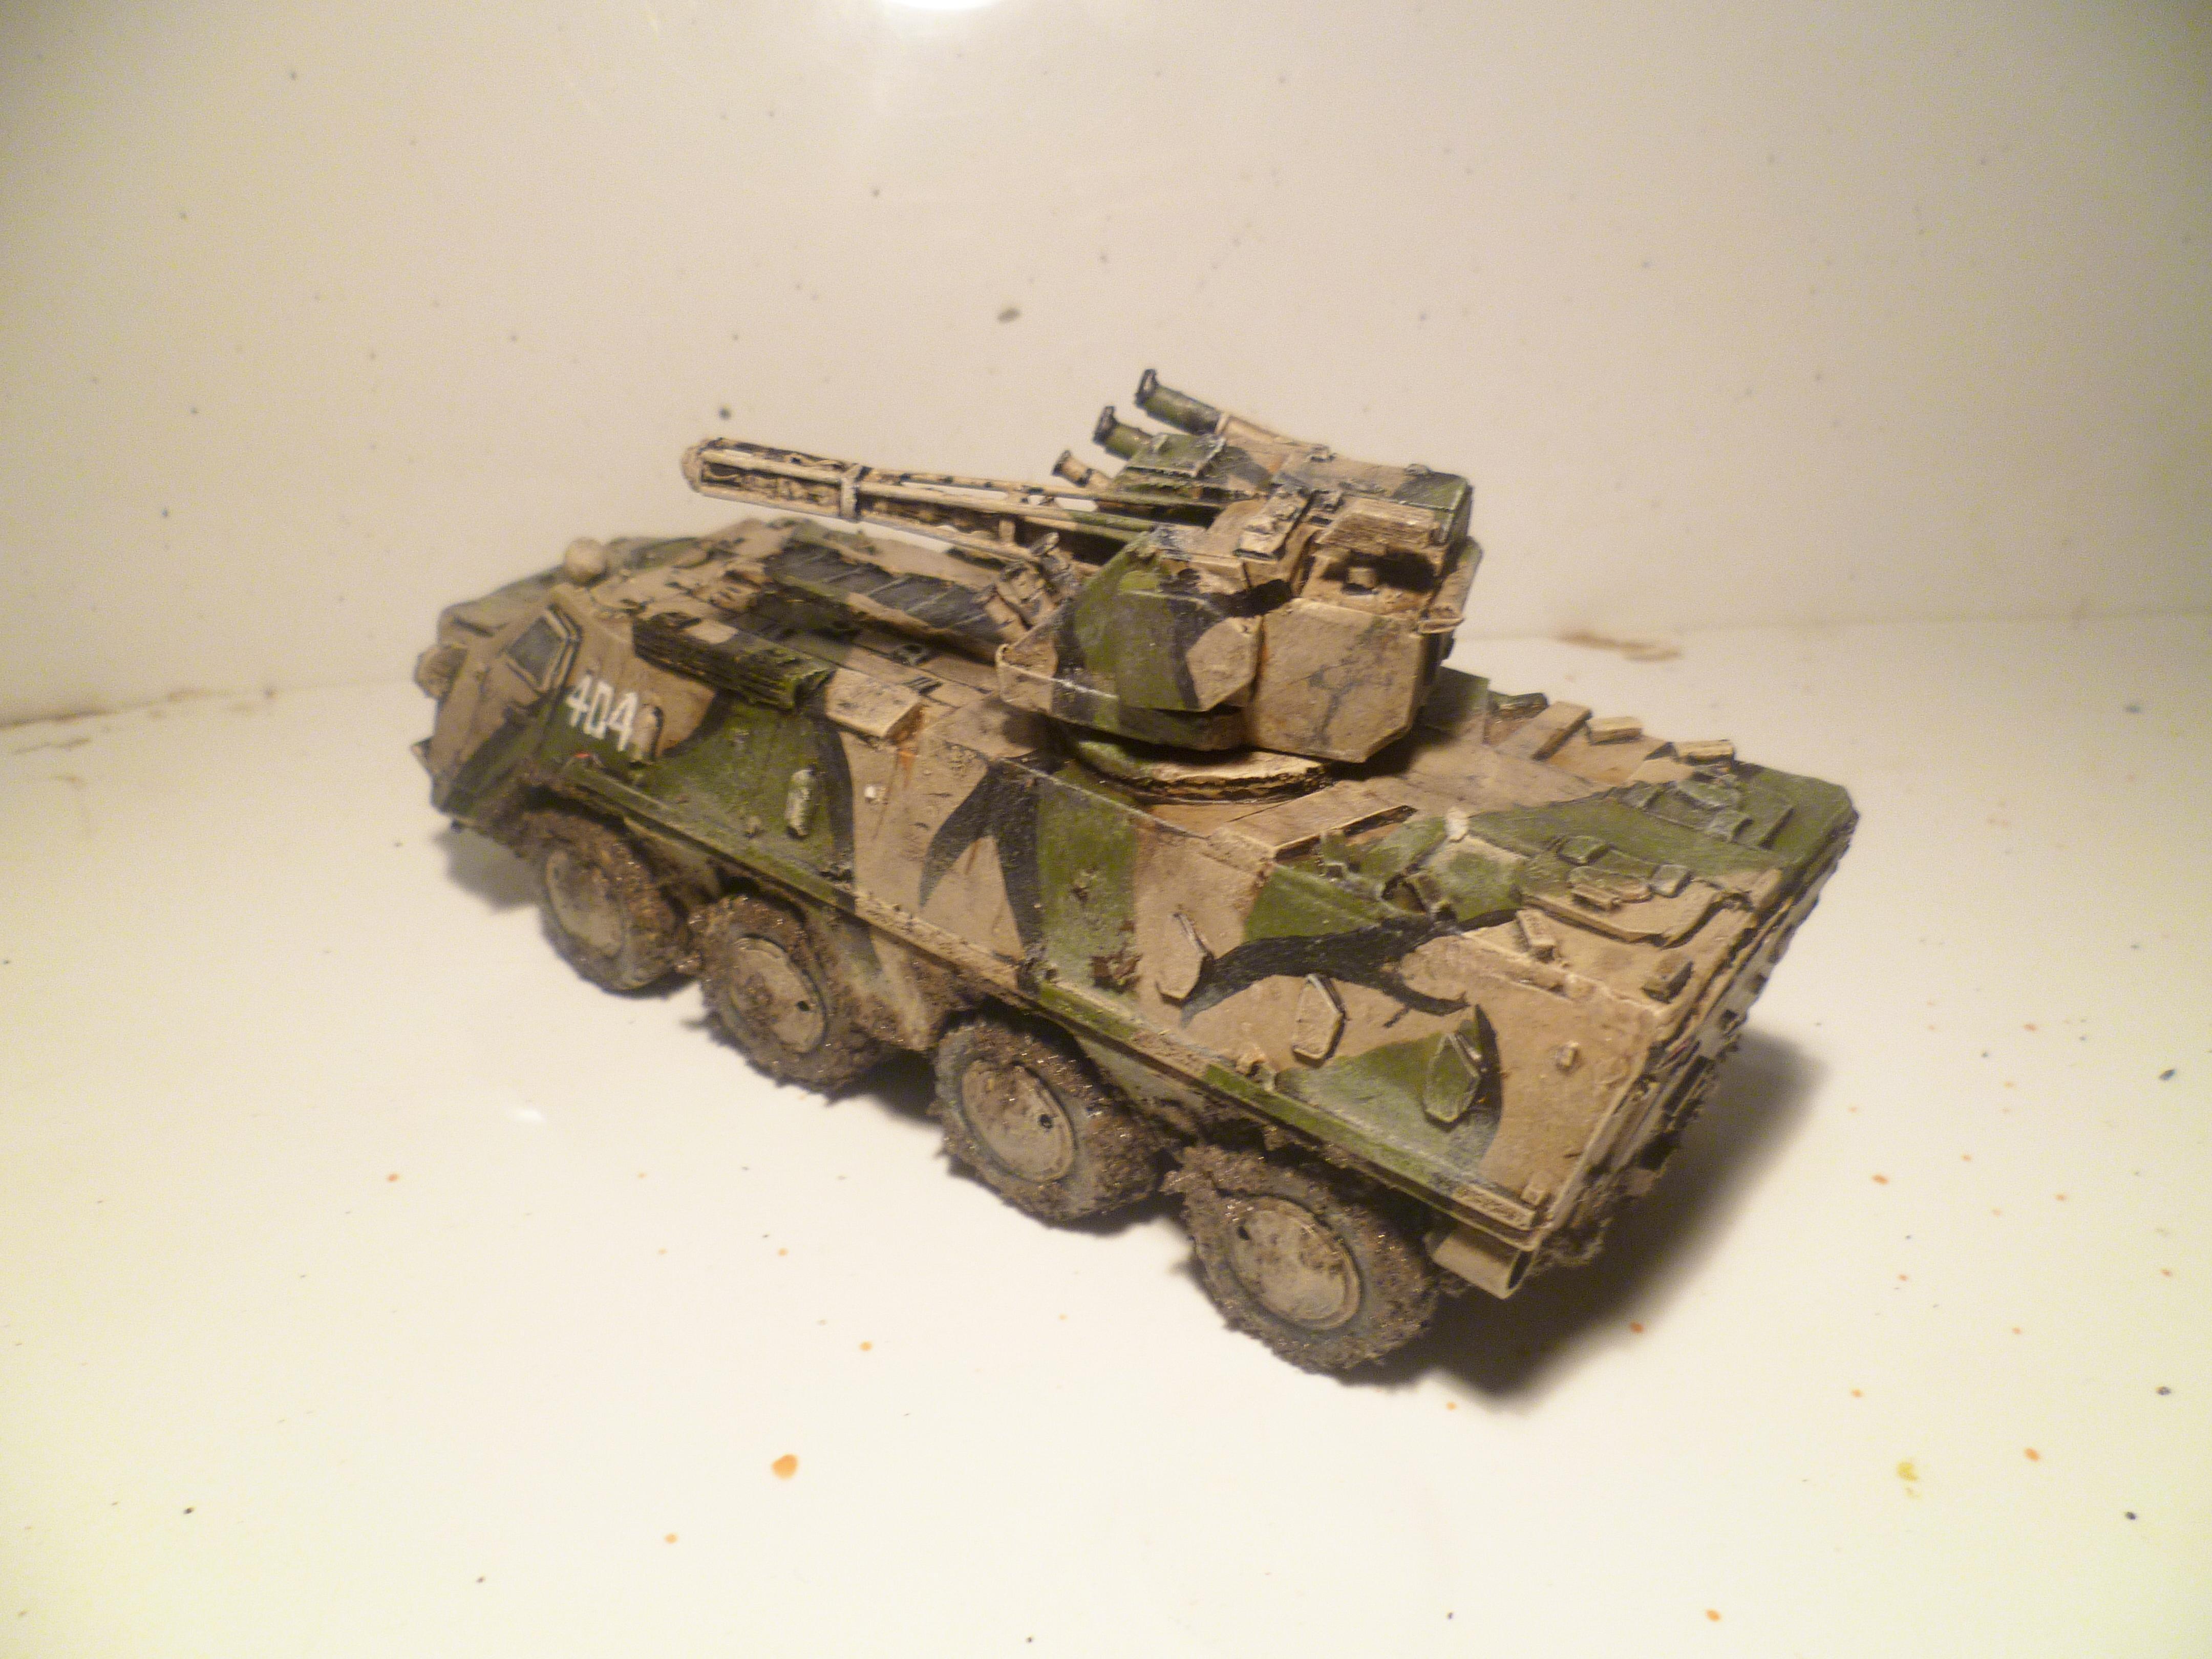 28mm, Apc, Built, Conversion, Eastern European, Ifv, Modern, Russians, Scratch, Ukrainian, Vehicle